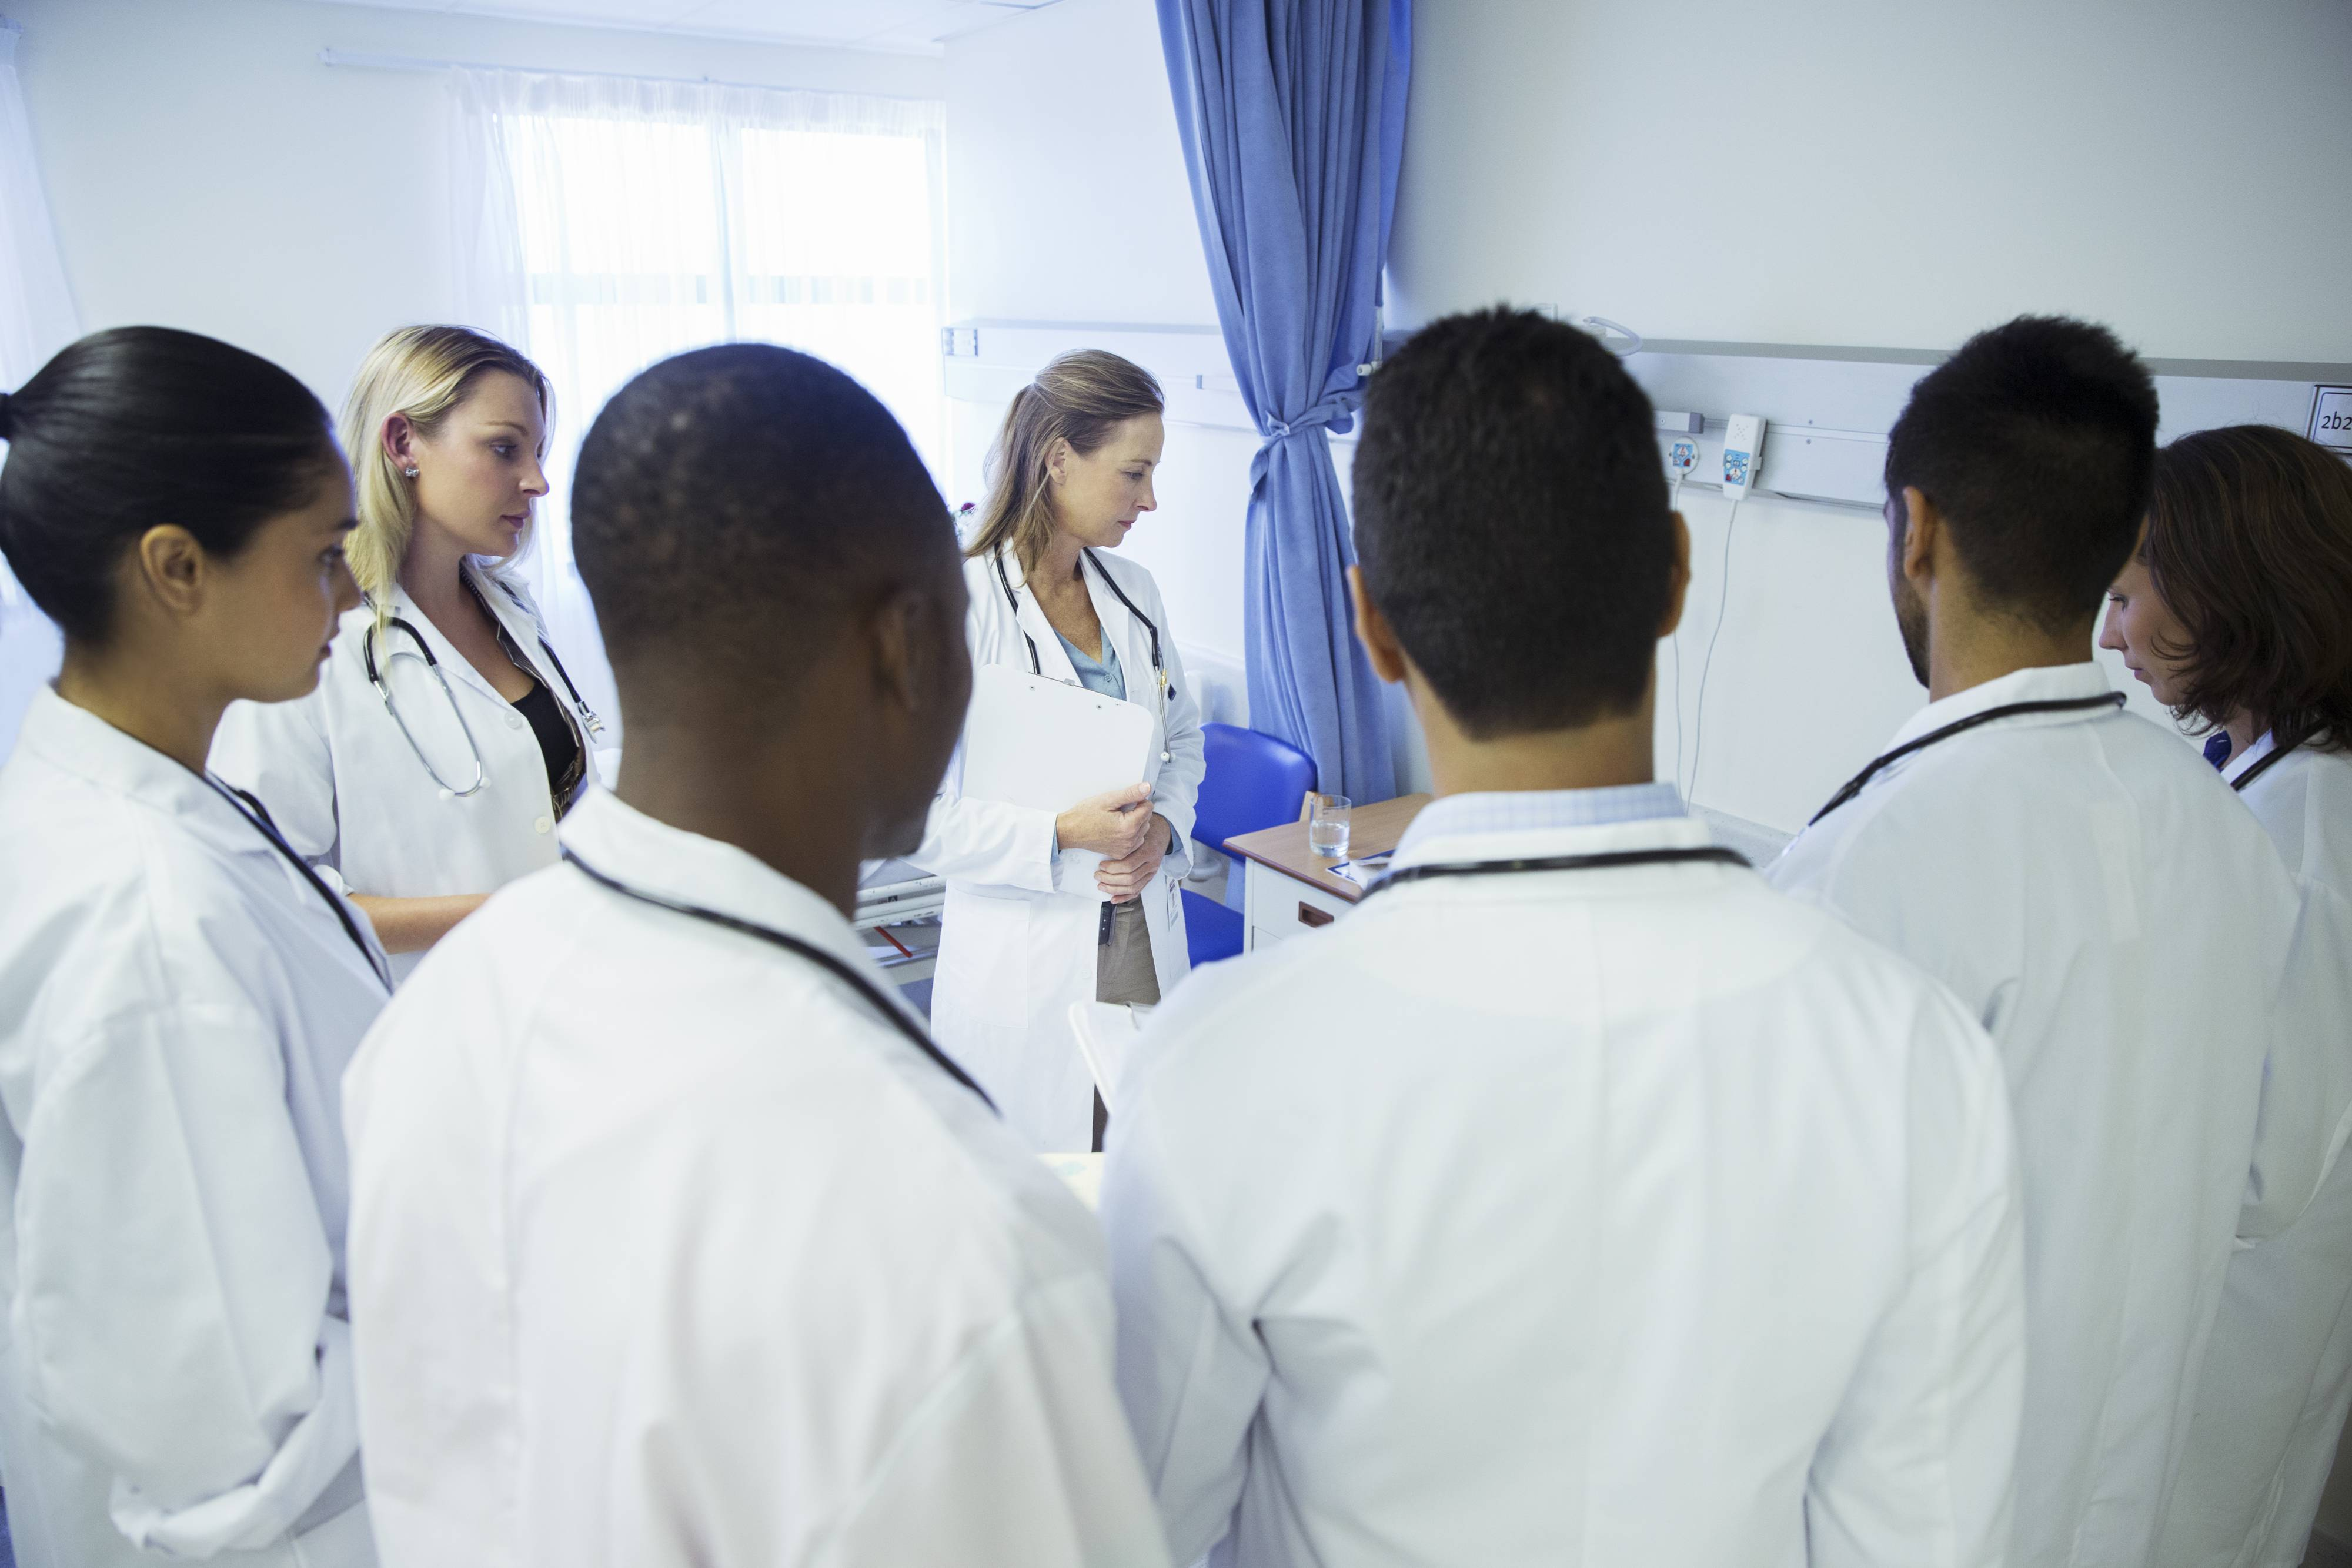 NYU free medical tuition